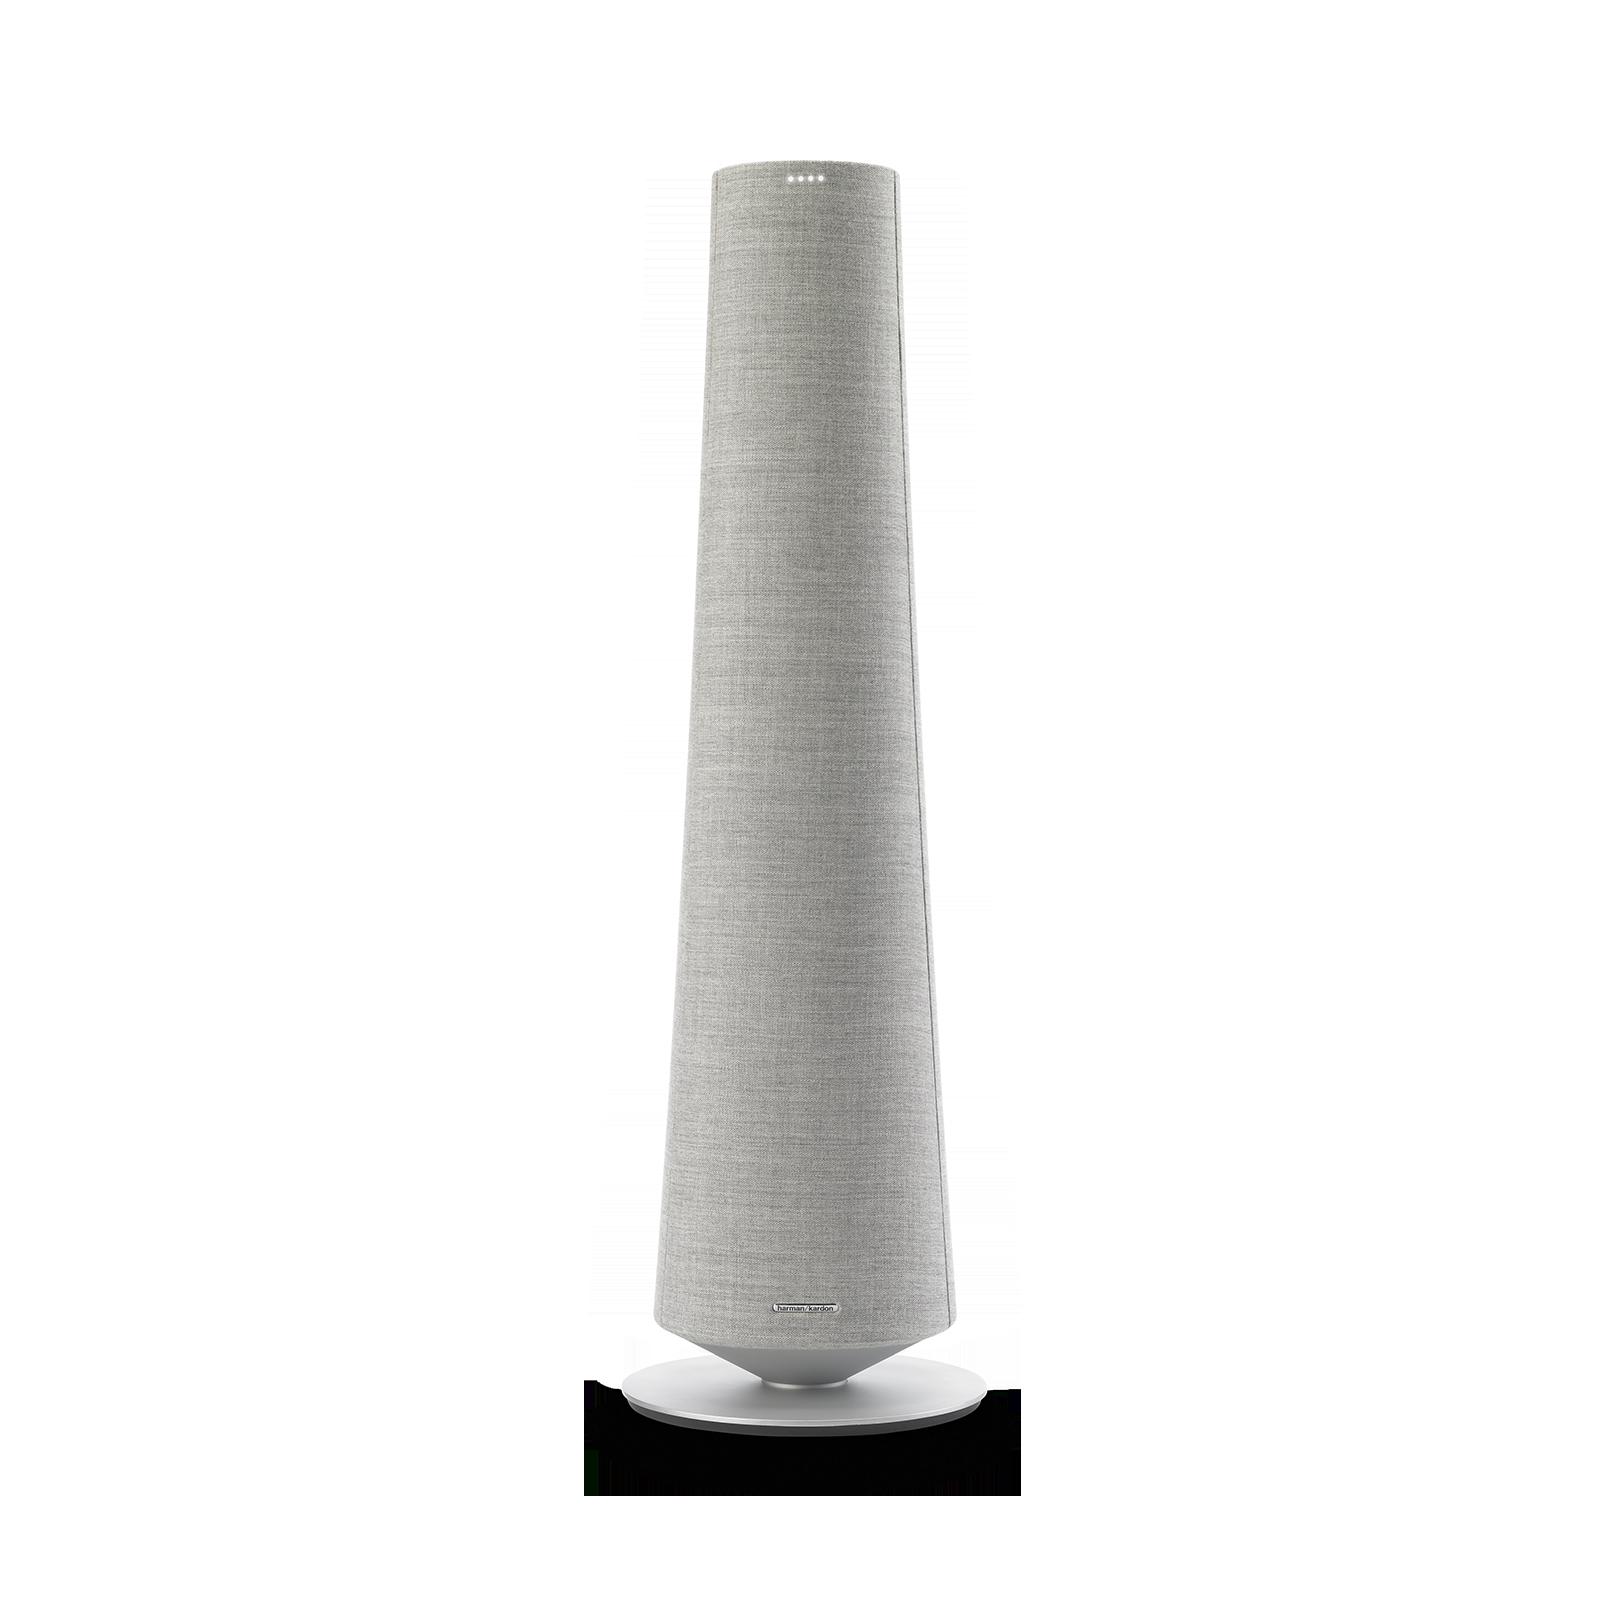 Harman Kardon Citation Tower - Grey - Smart Premium Floorstanding Speaker that delivers an impactful performance - Front